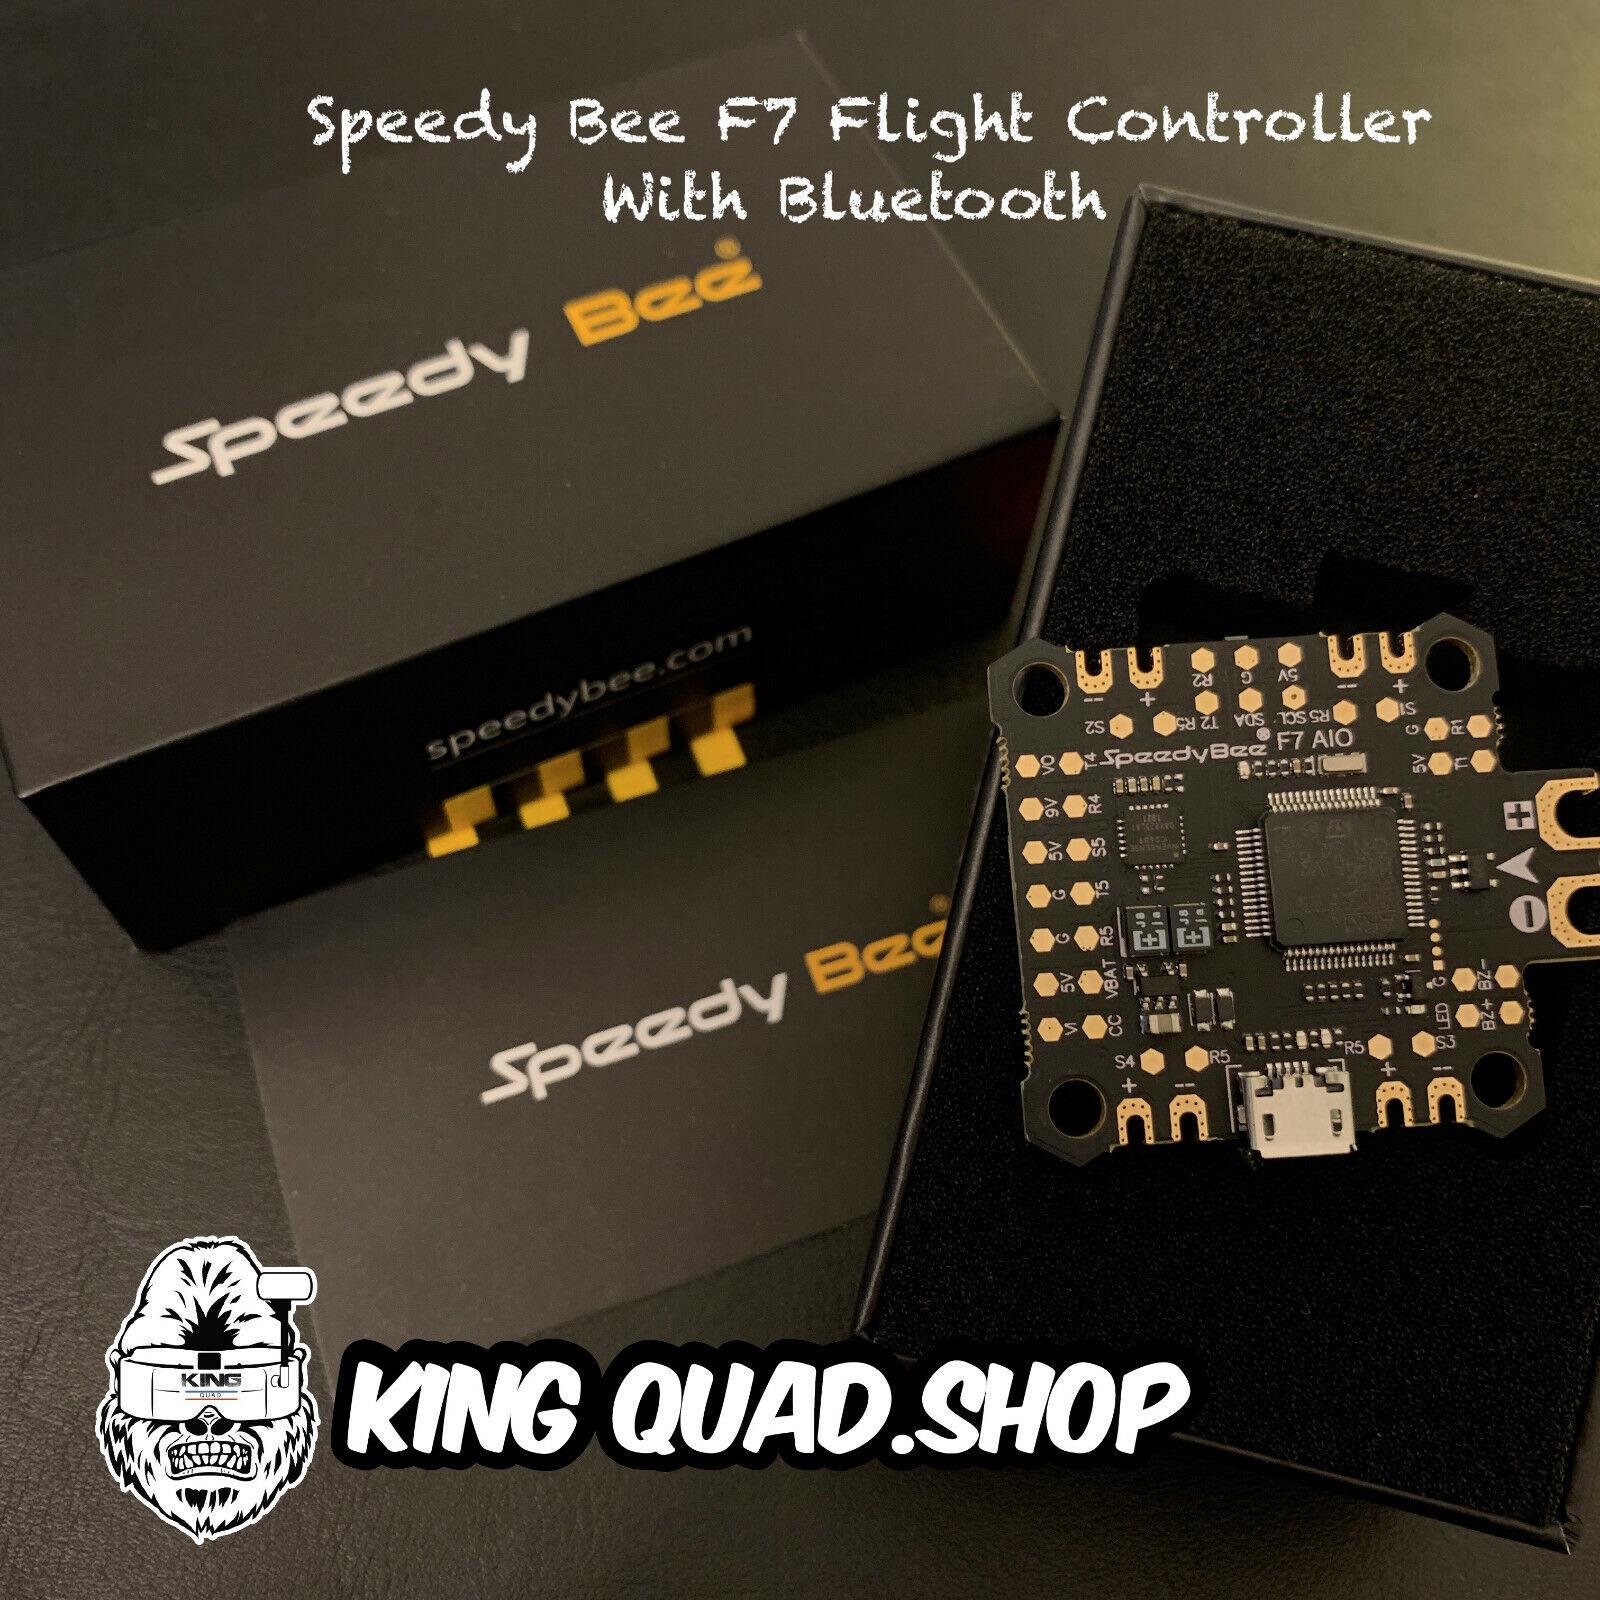 SpeedyBee F7 AIO Flight Controller With Bluetooth 3s - 6s (TX600)